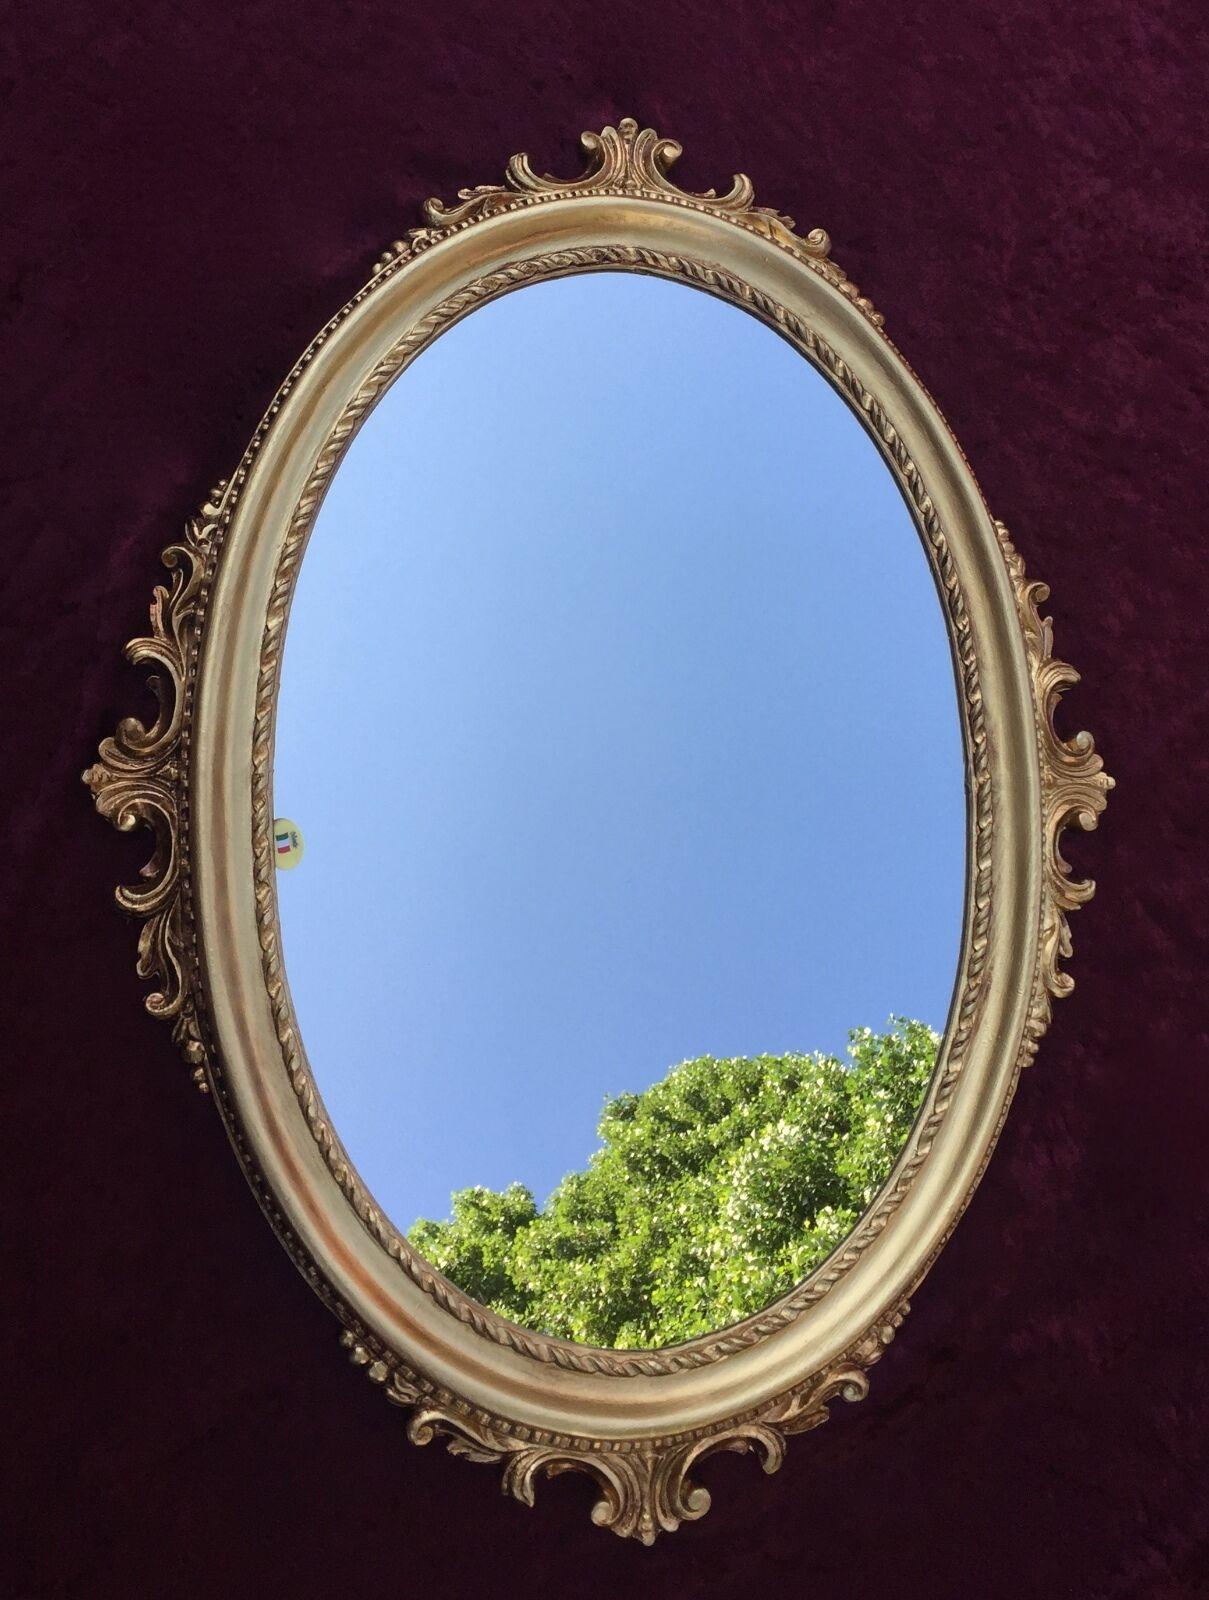 wandspiegel antik silber oval barock badspiegel spiegel 62x48cm flurspiegel c12 eur 69 00. Black Bedroom Furniture Sets. Home Design Ideas